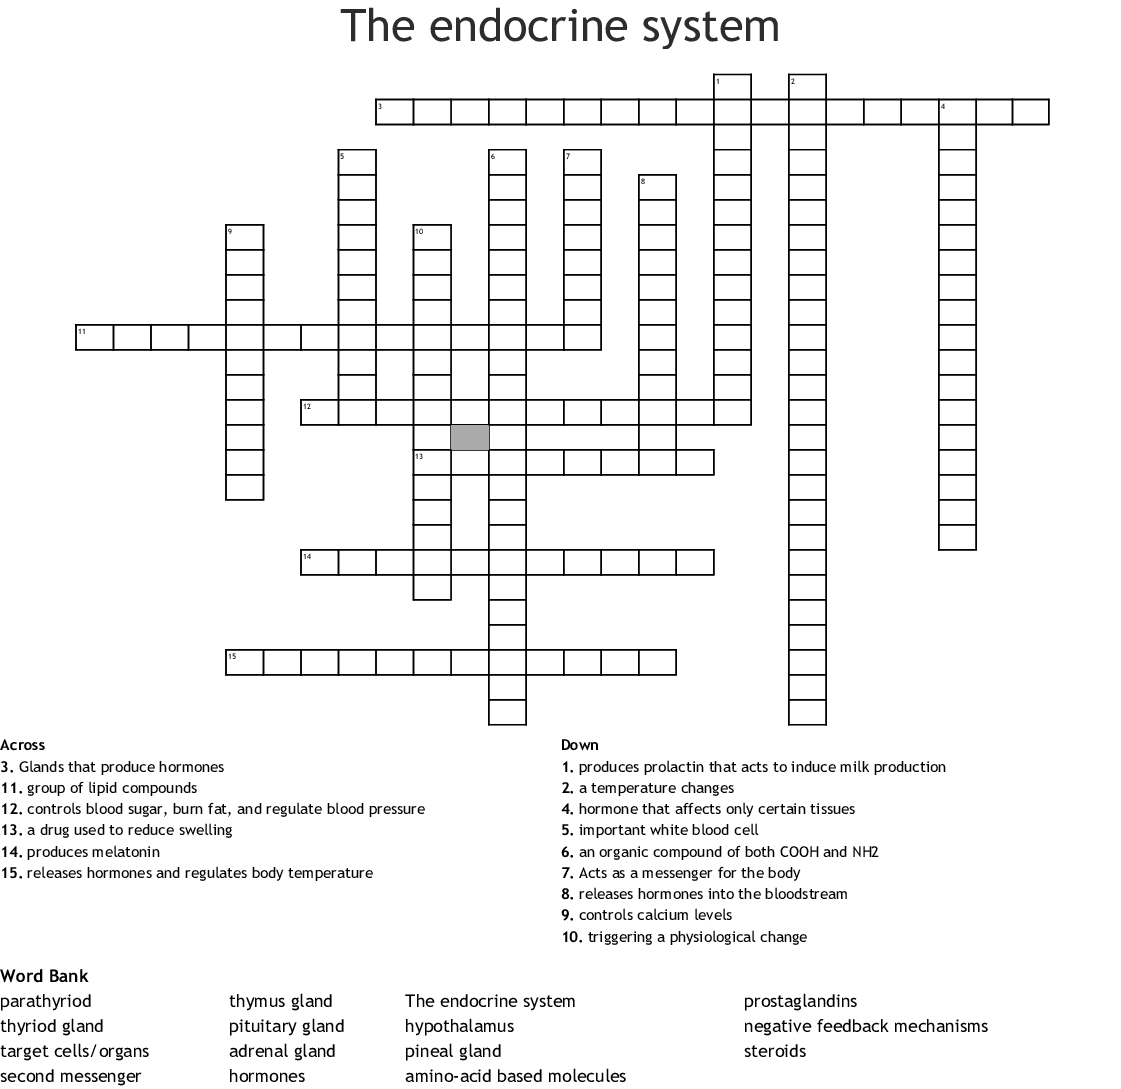 The Endocrine System Crossword